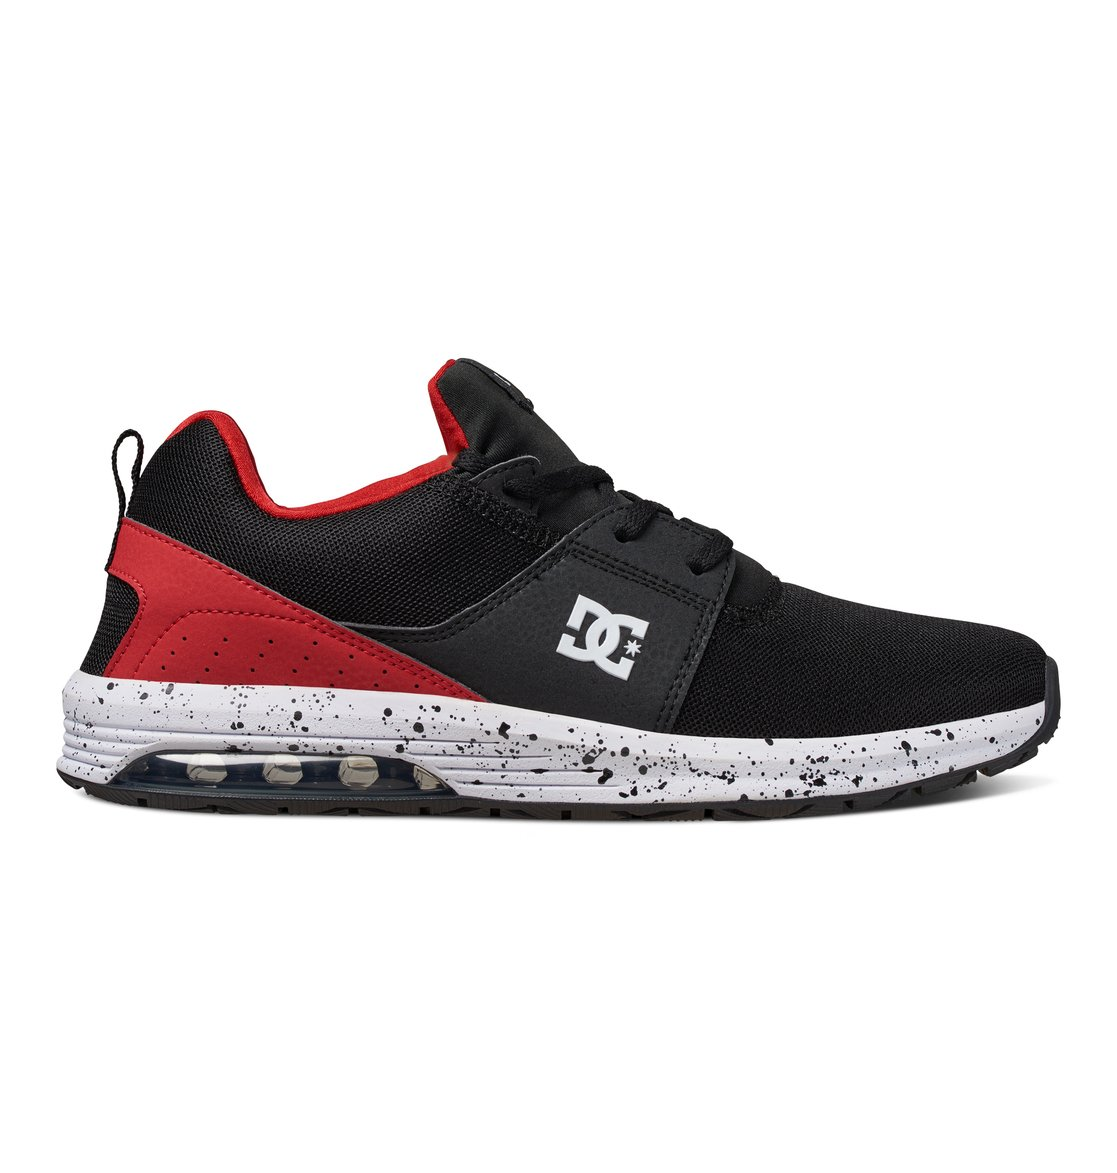 heathrow ia shoes 888327695600 dc shoes. Black Bedroom Furniture Sets. Home Design Ideas